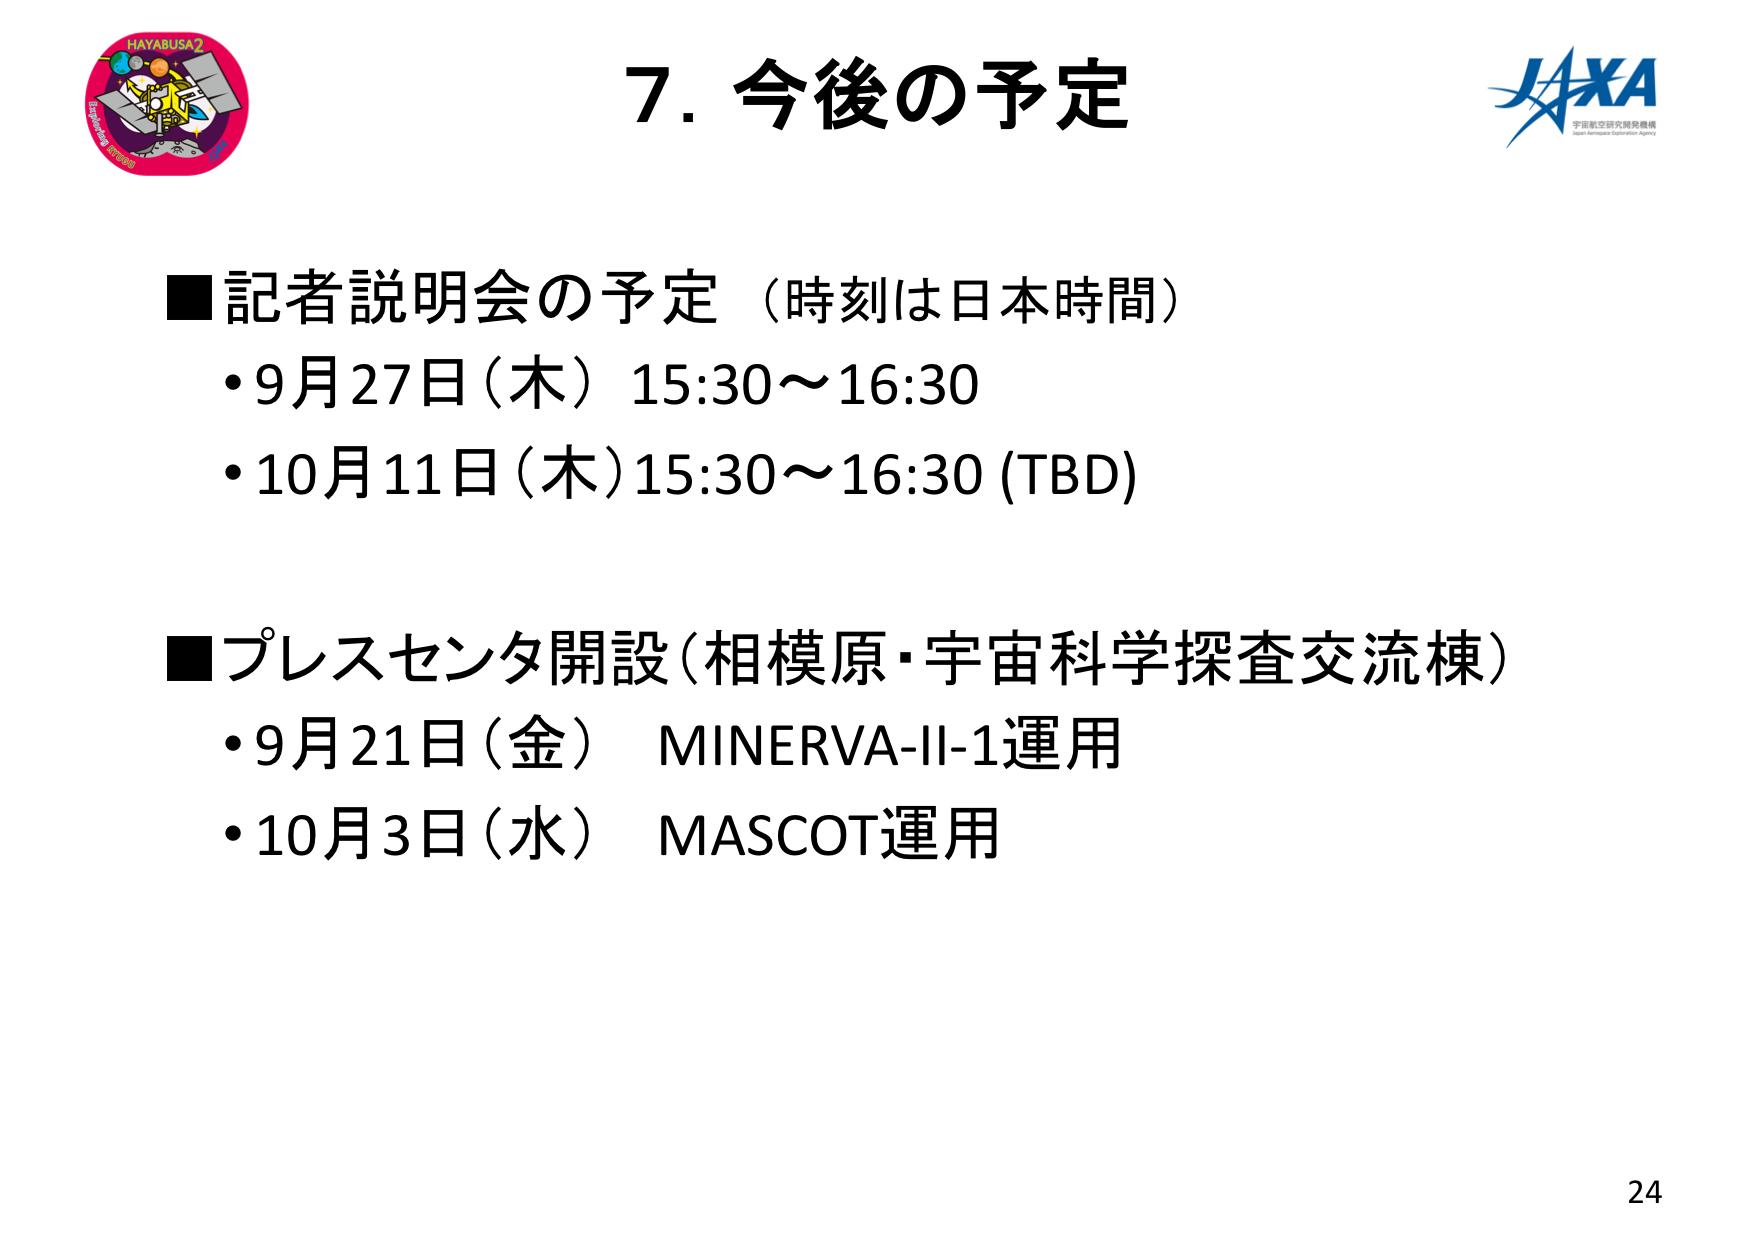 f:id:Imamura:20180905231956p:plain